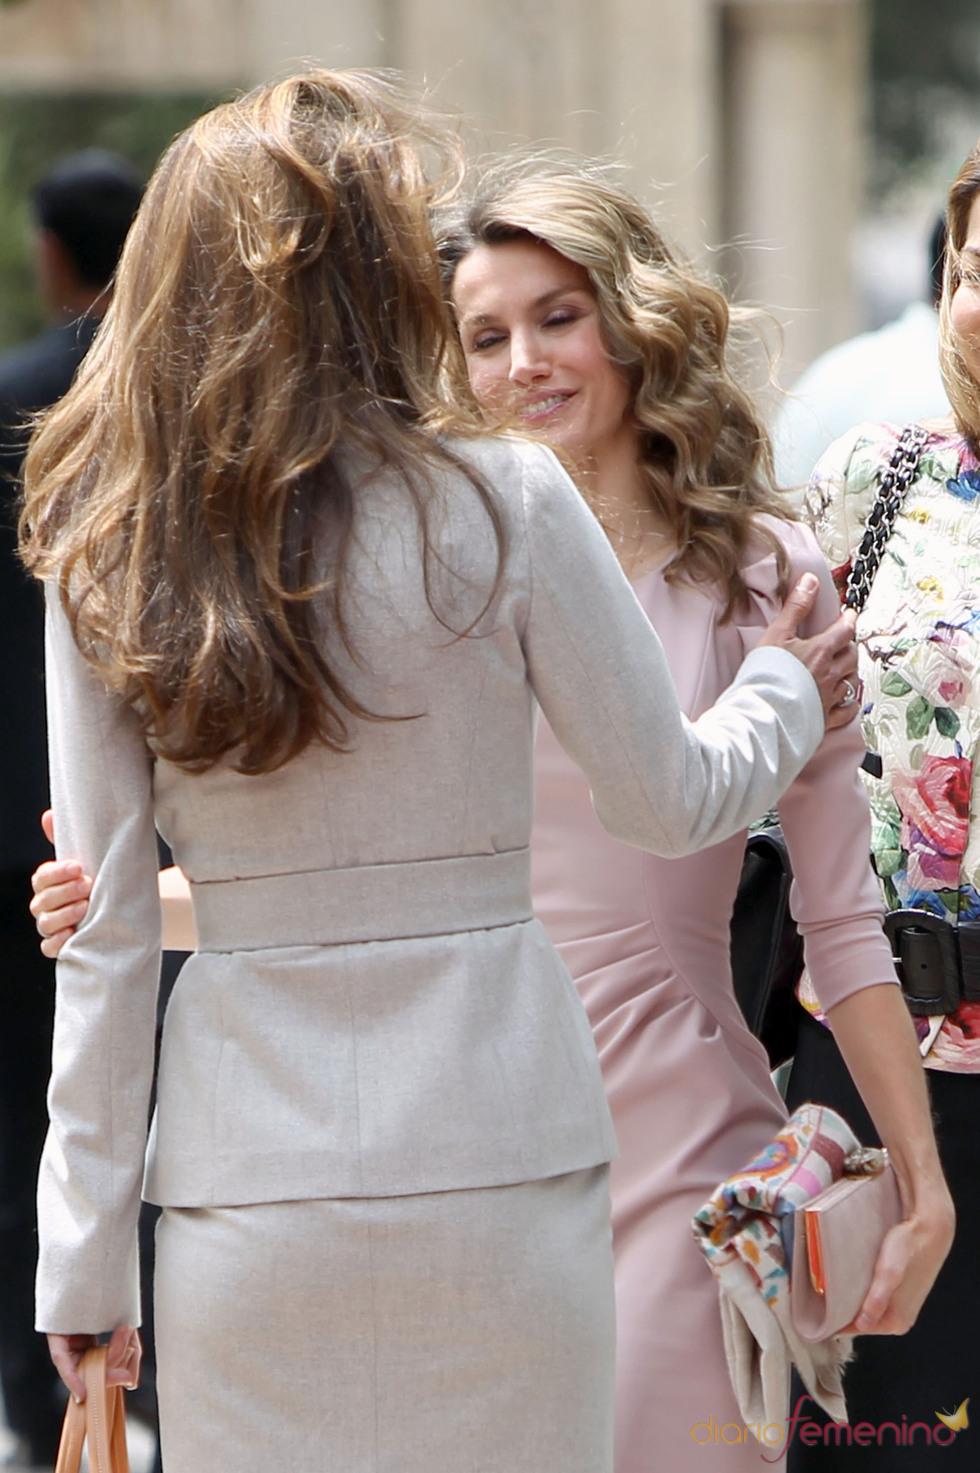 Cariñoso saludo entre la Reina Rania de Jordania y la Princesa Letizia en Jordania